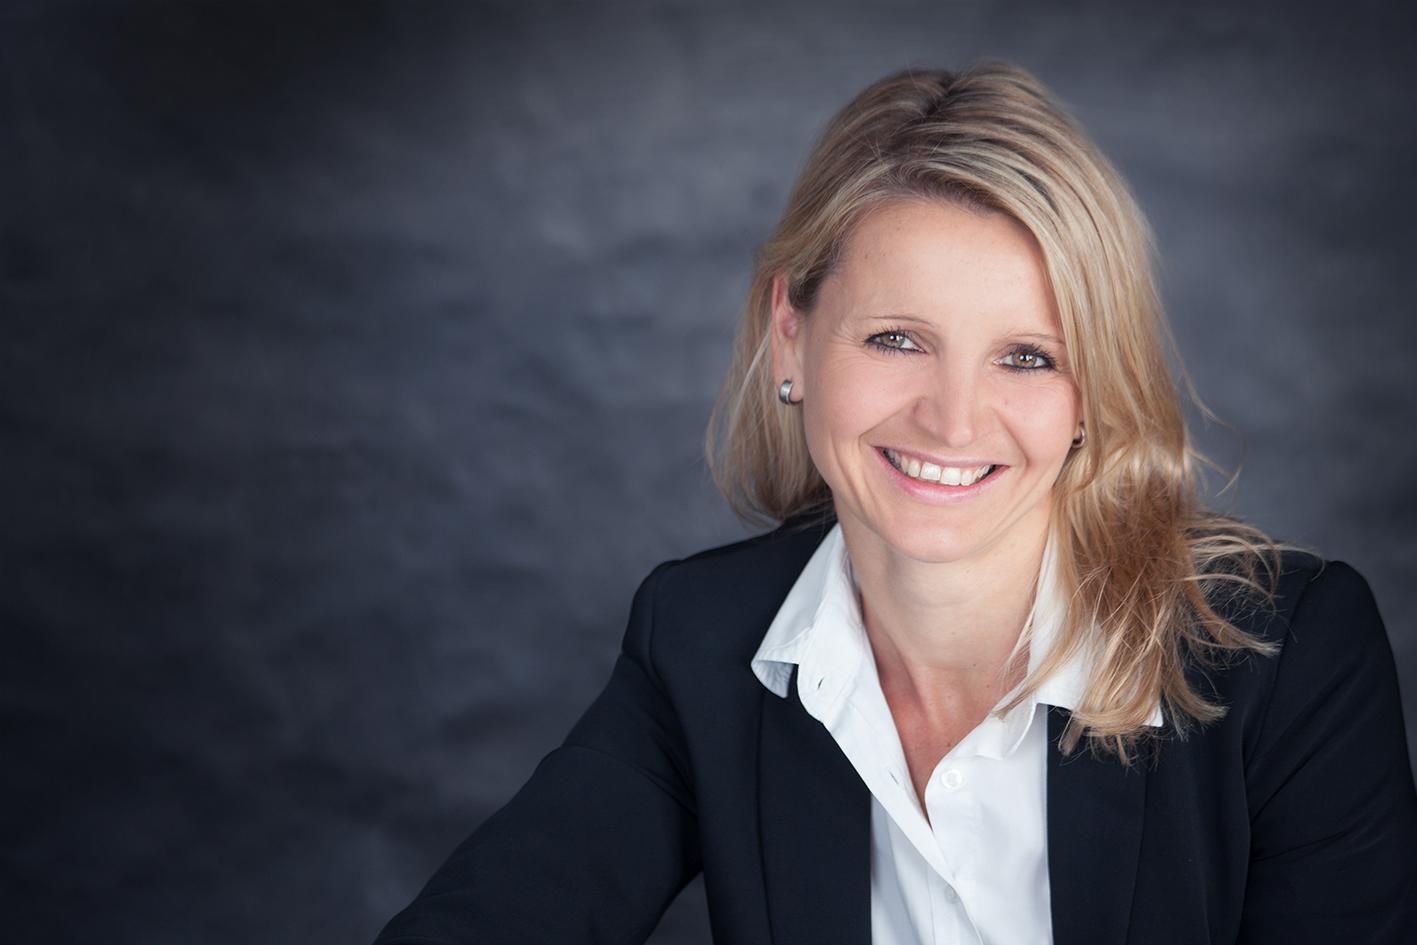 Cindy Luger